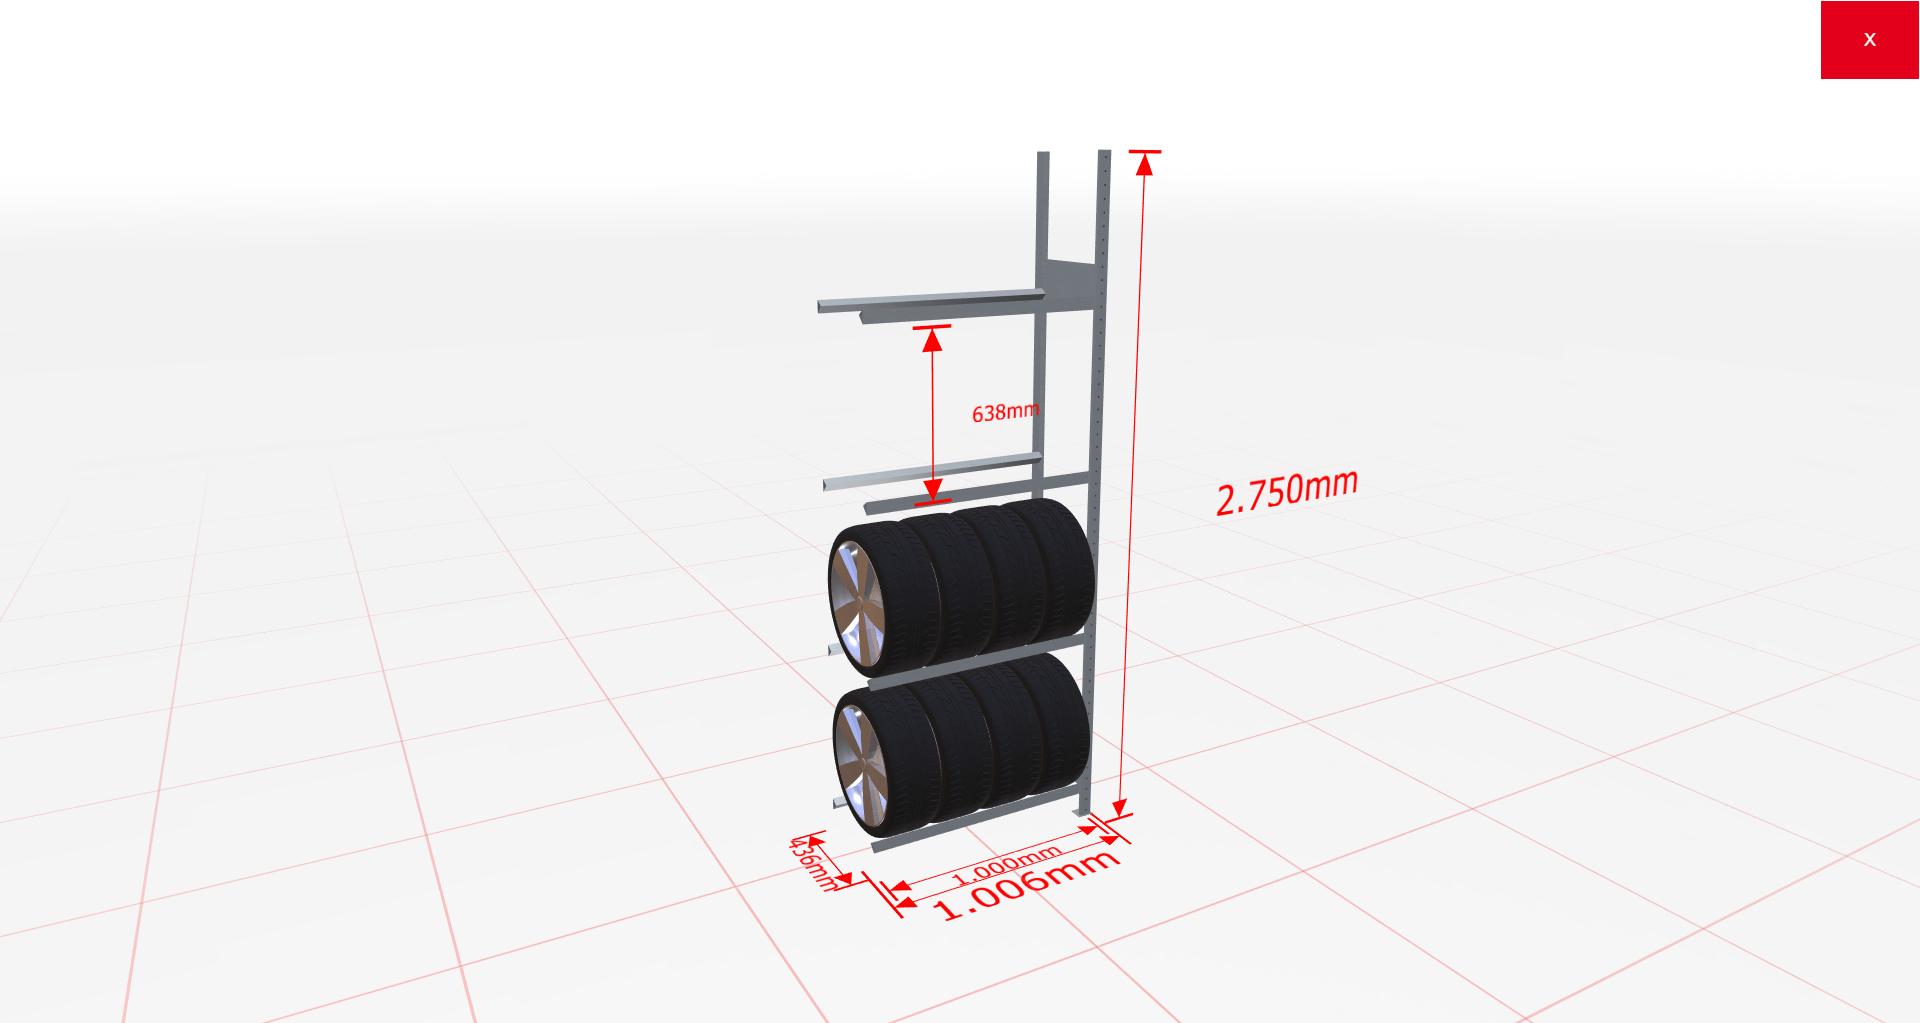 Räderregal Anbauregal SCHULTE Lagertechnik 2750x1000x400 mm – 4 Ebenen á 1000 mm, verzinkt